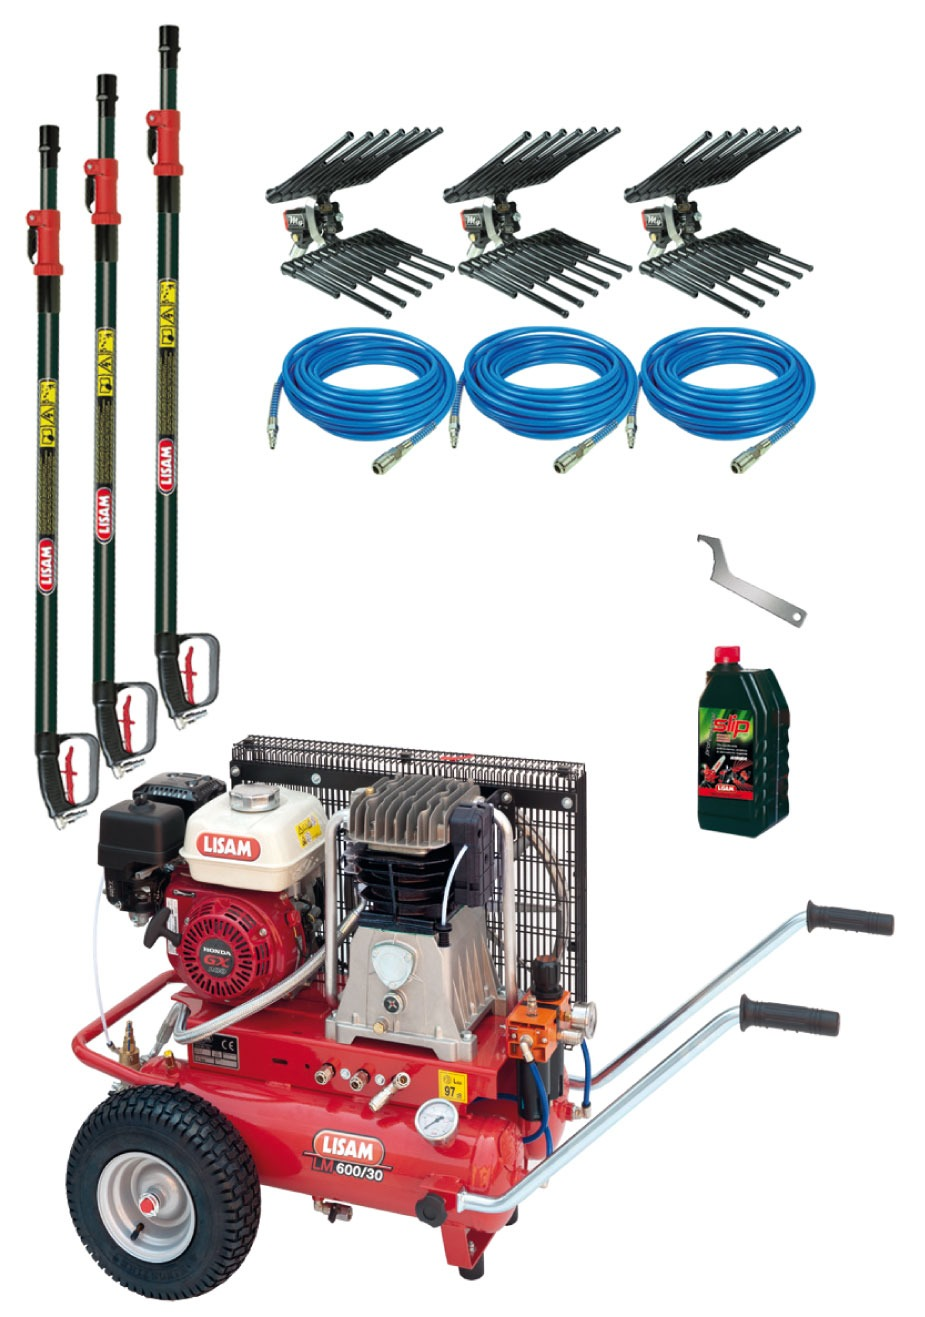 Motocompressore Lisam kit professional per 2 operatori